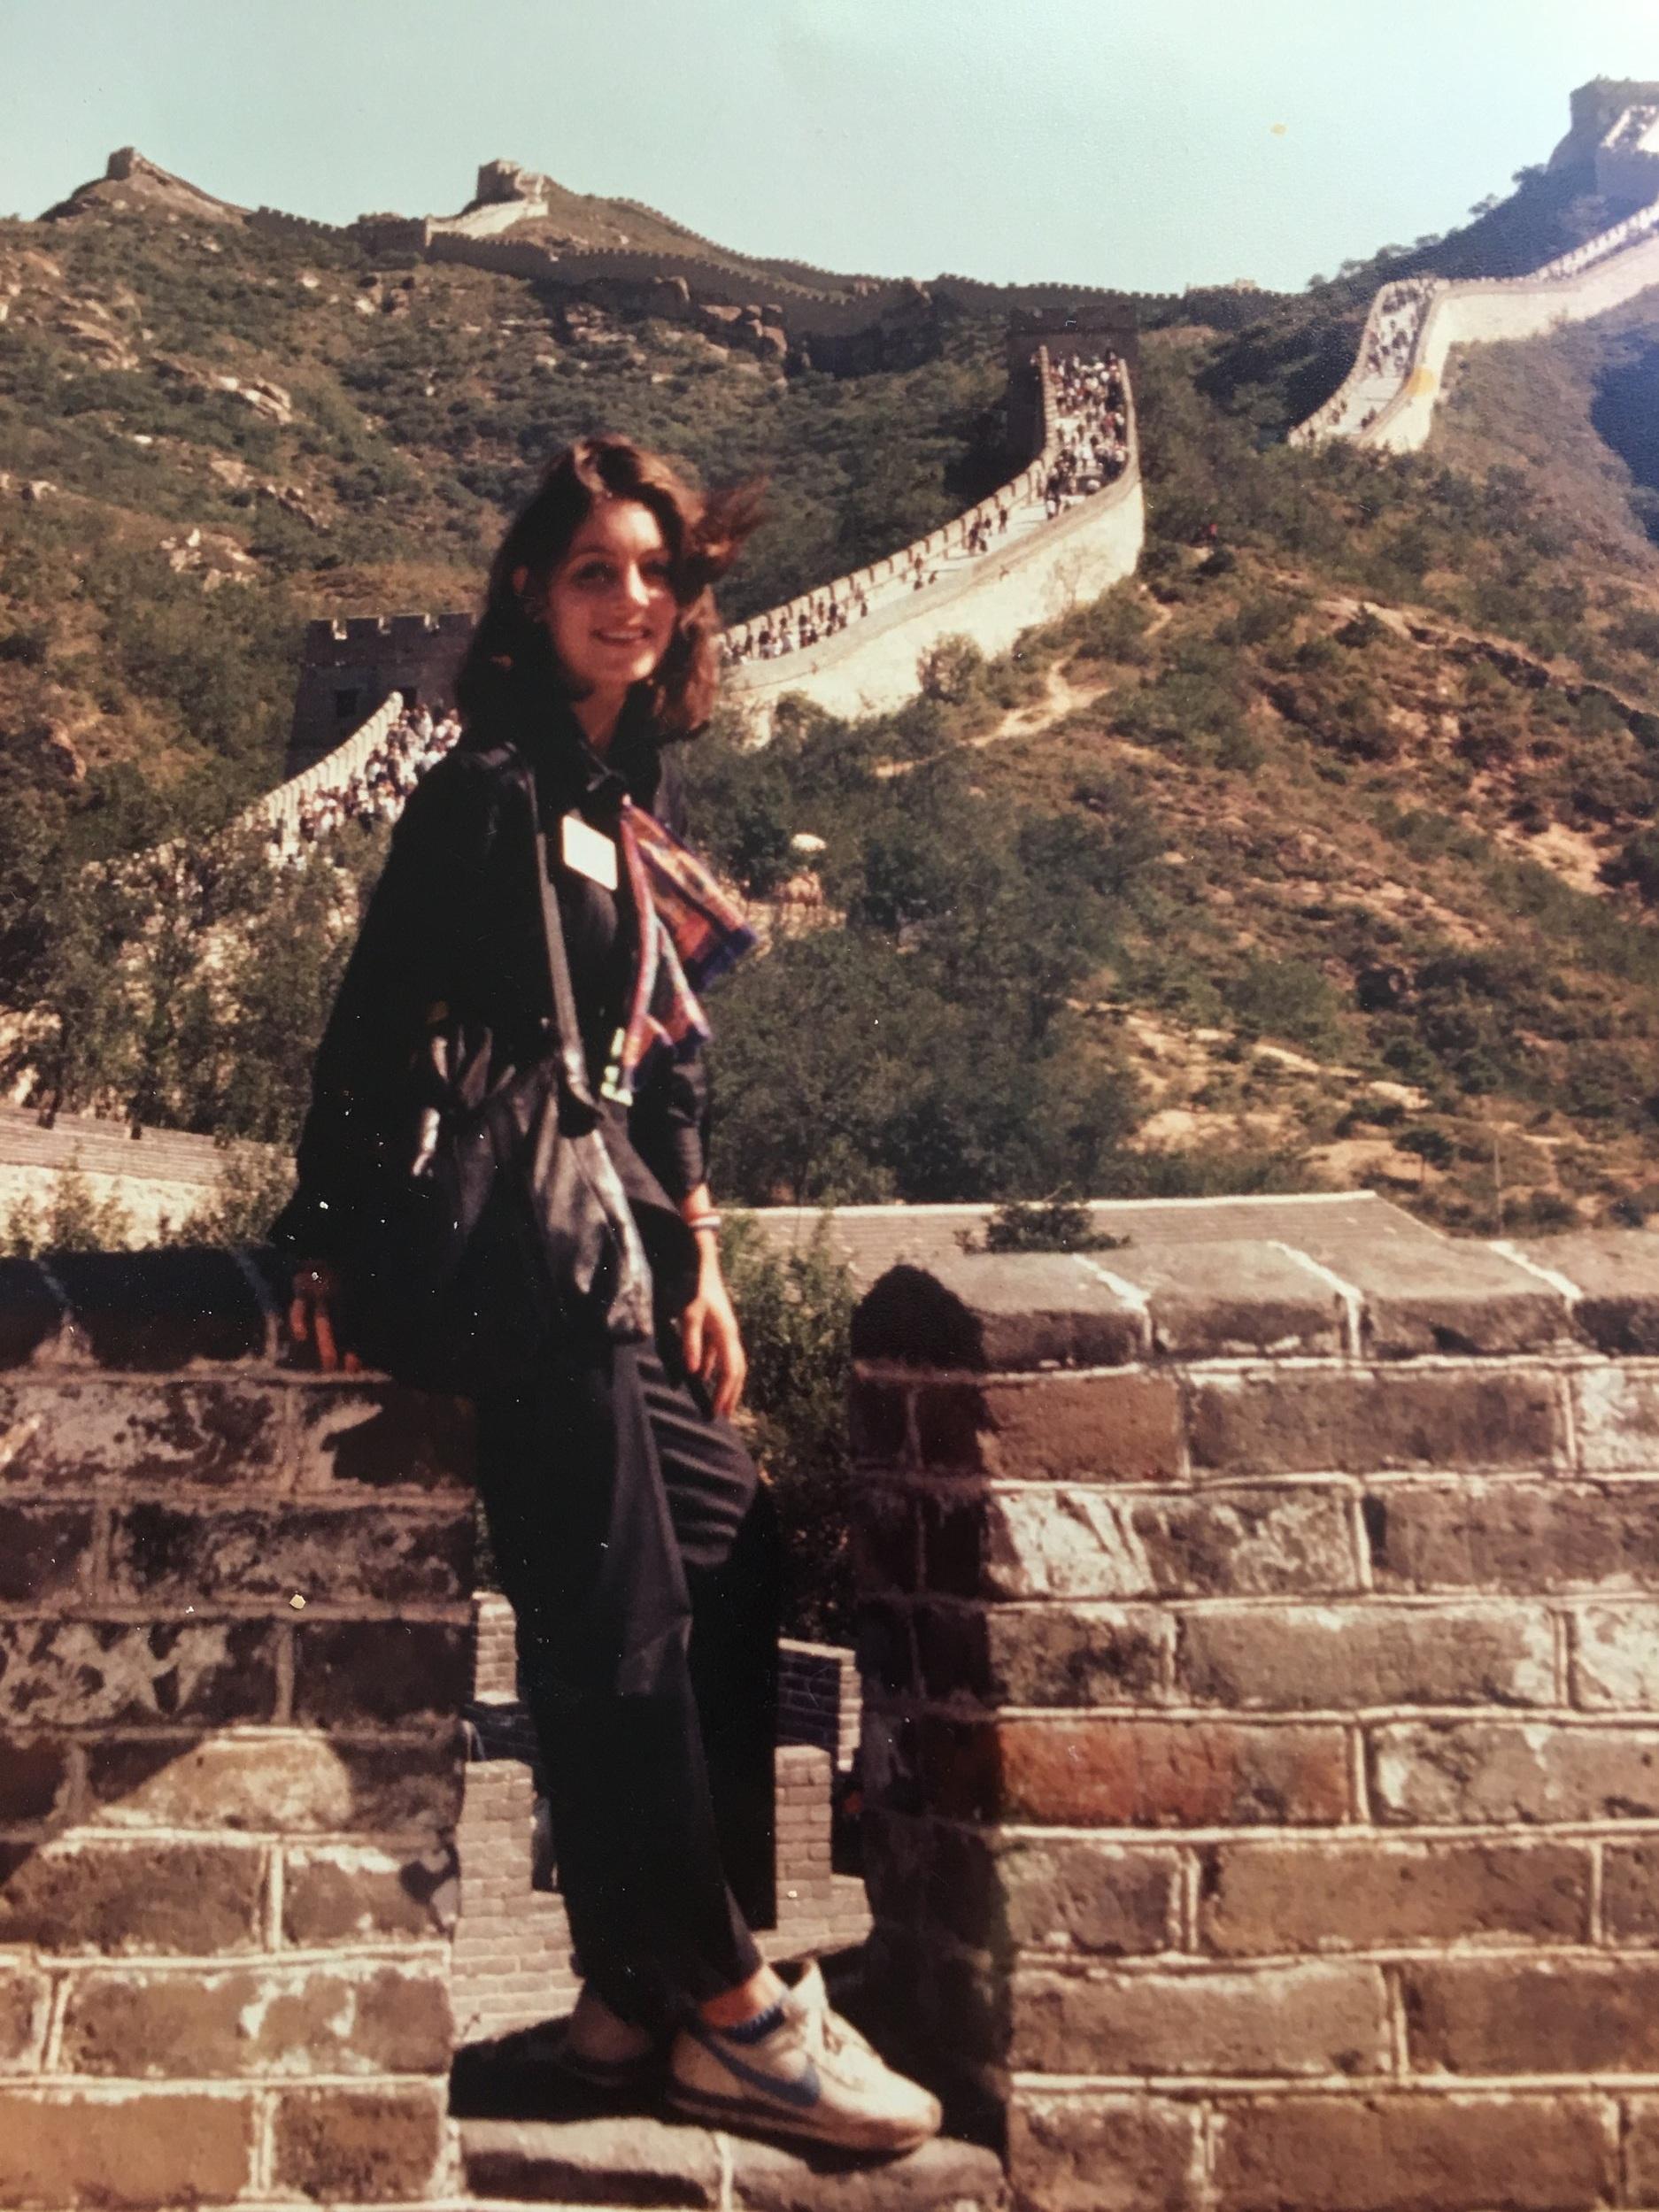 photo+Bonnie+great+wall+1981.jpg